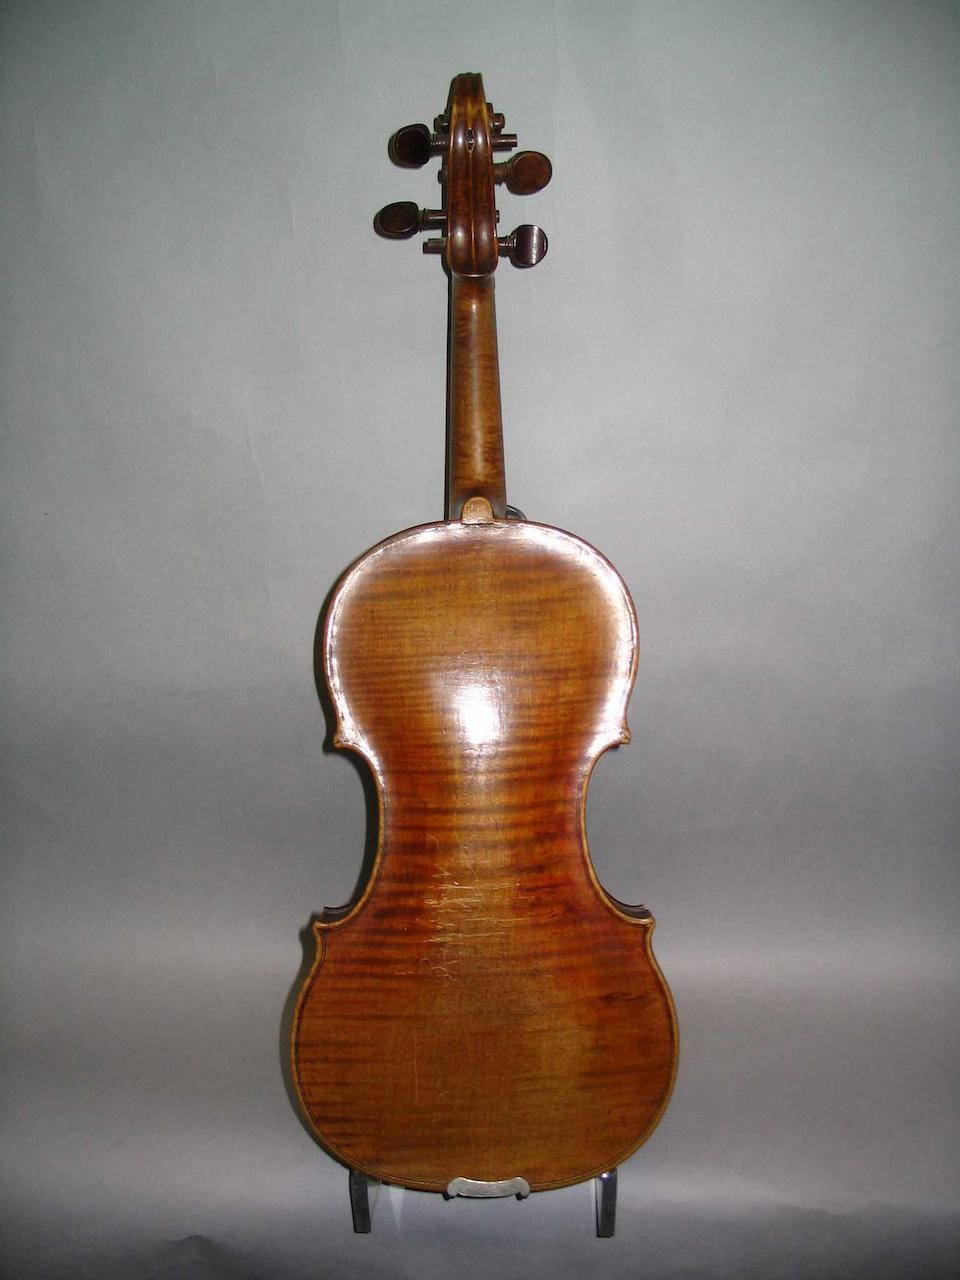 An Bohemian Violin of some quality, circa 1890